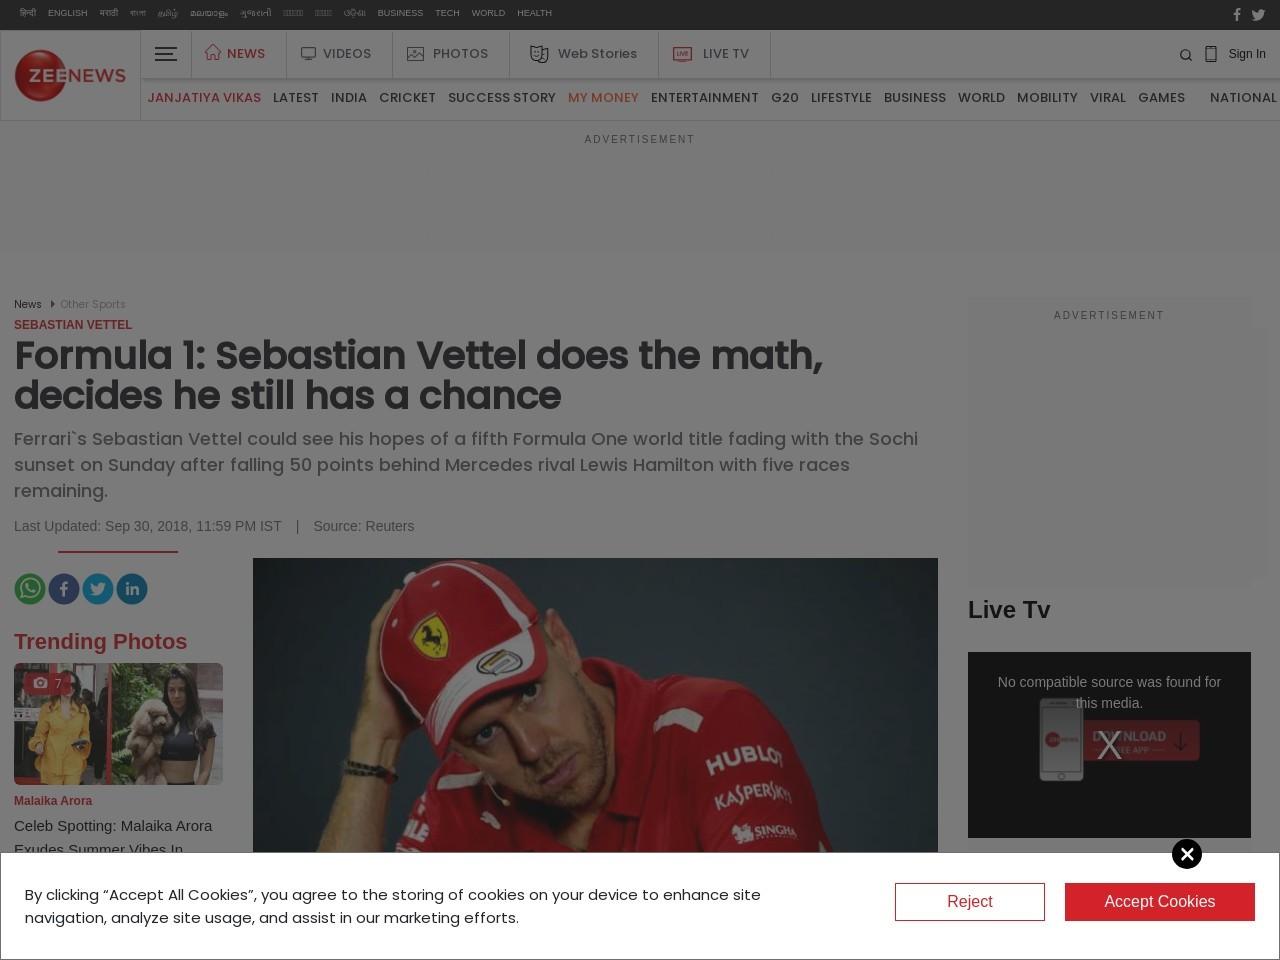 Formula 1: Sebastian Vettel does the math, decides he still has a chance